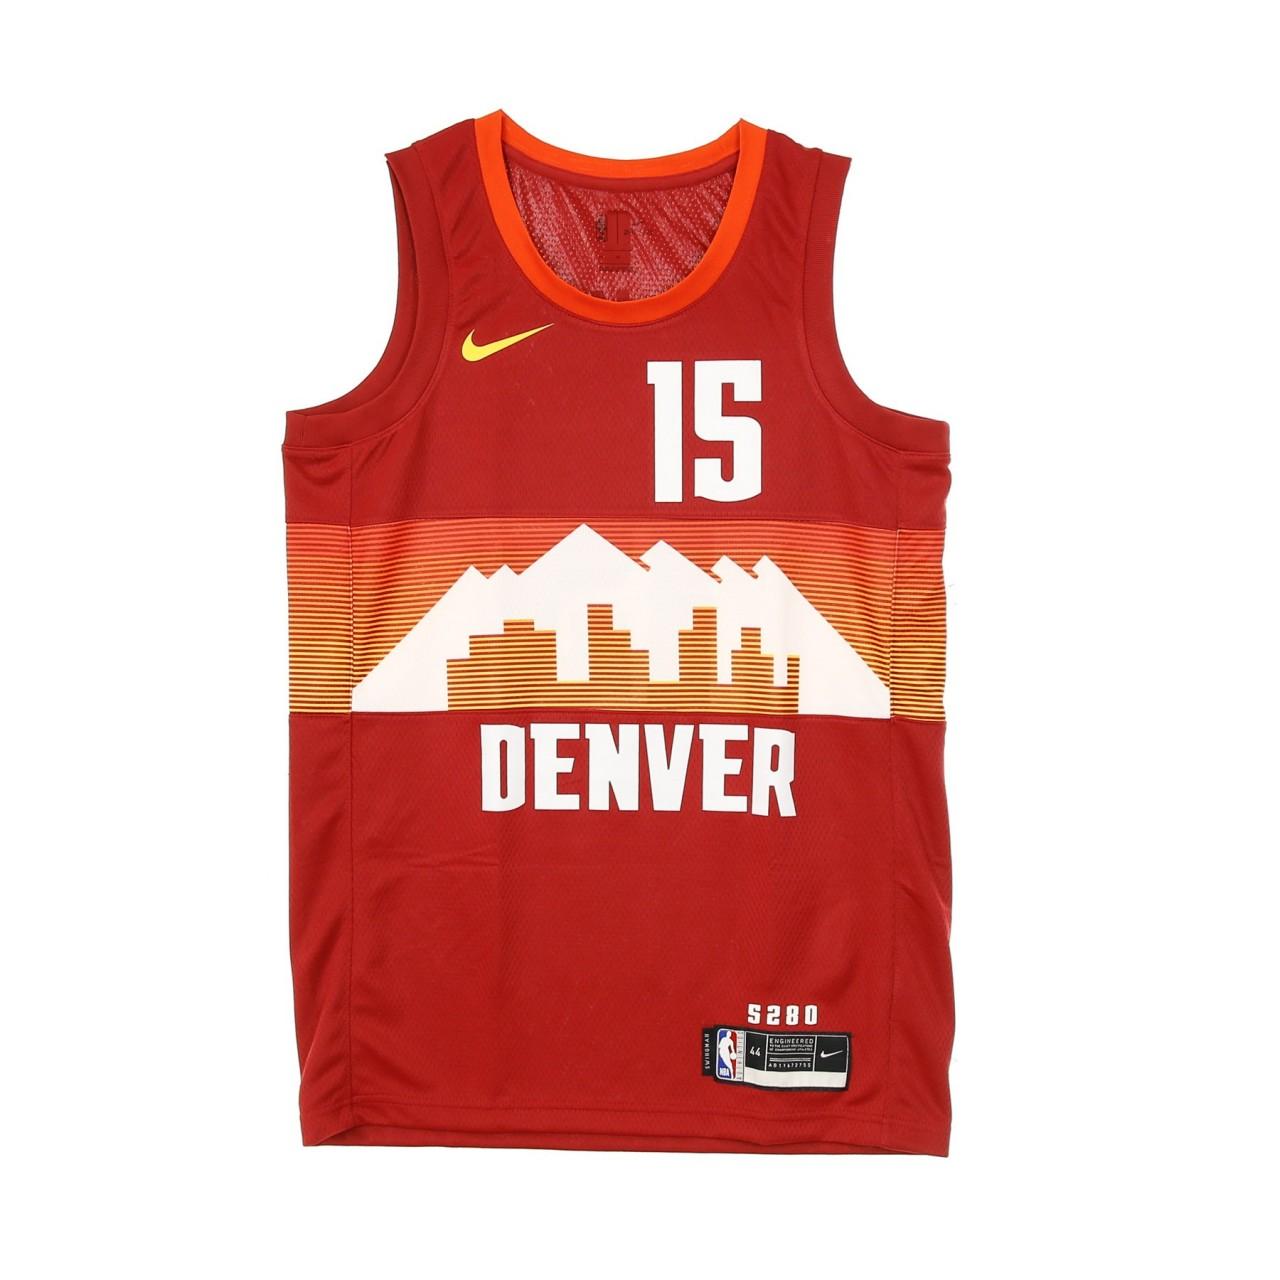 NIKE NBA NBA SWINGMAN JERSEY CITY EDITION 2020 NO 15 NIKOLA JOKIC DENNUG CN1725-615